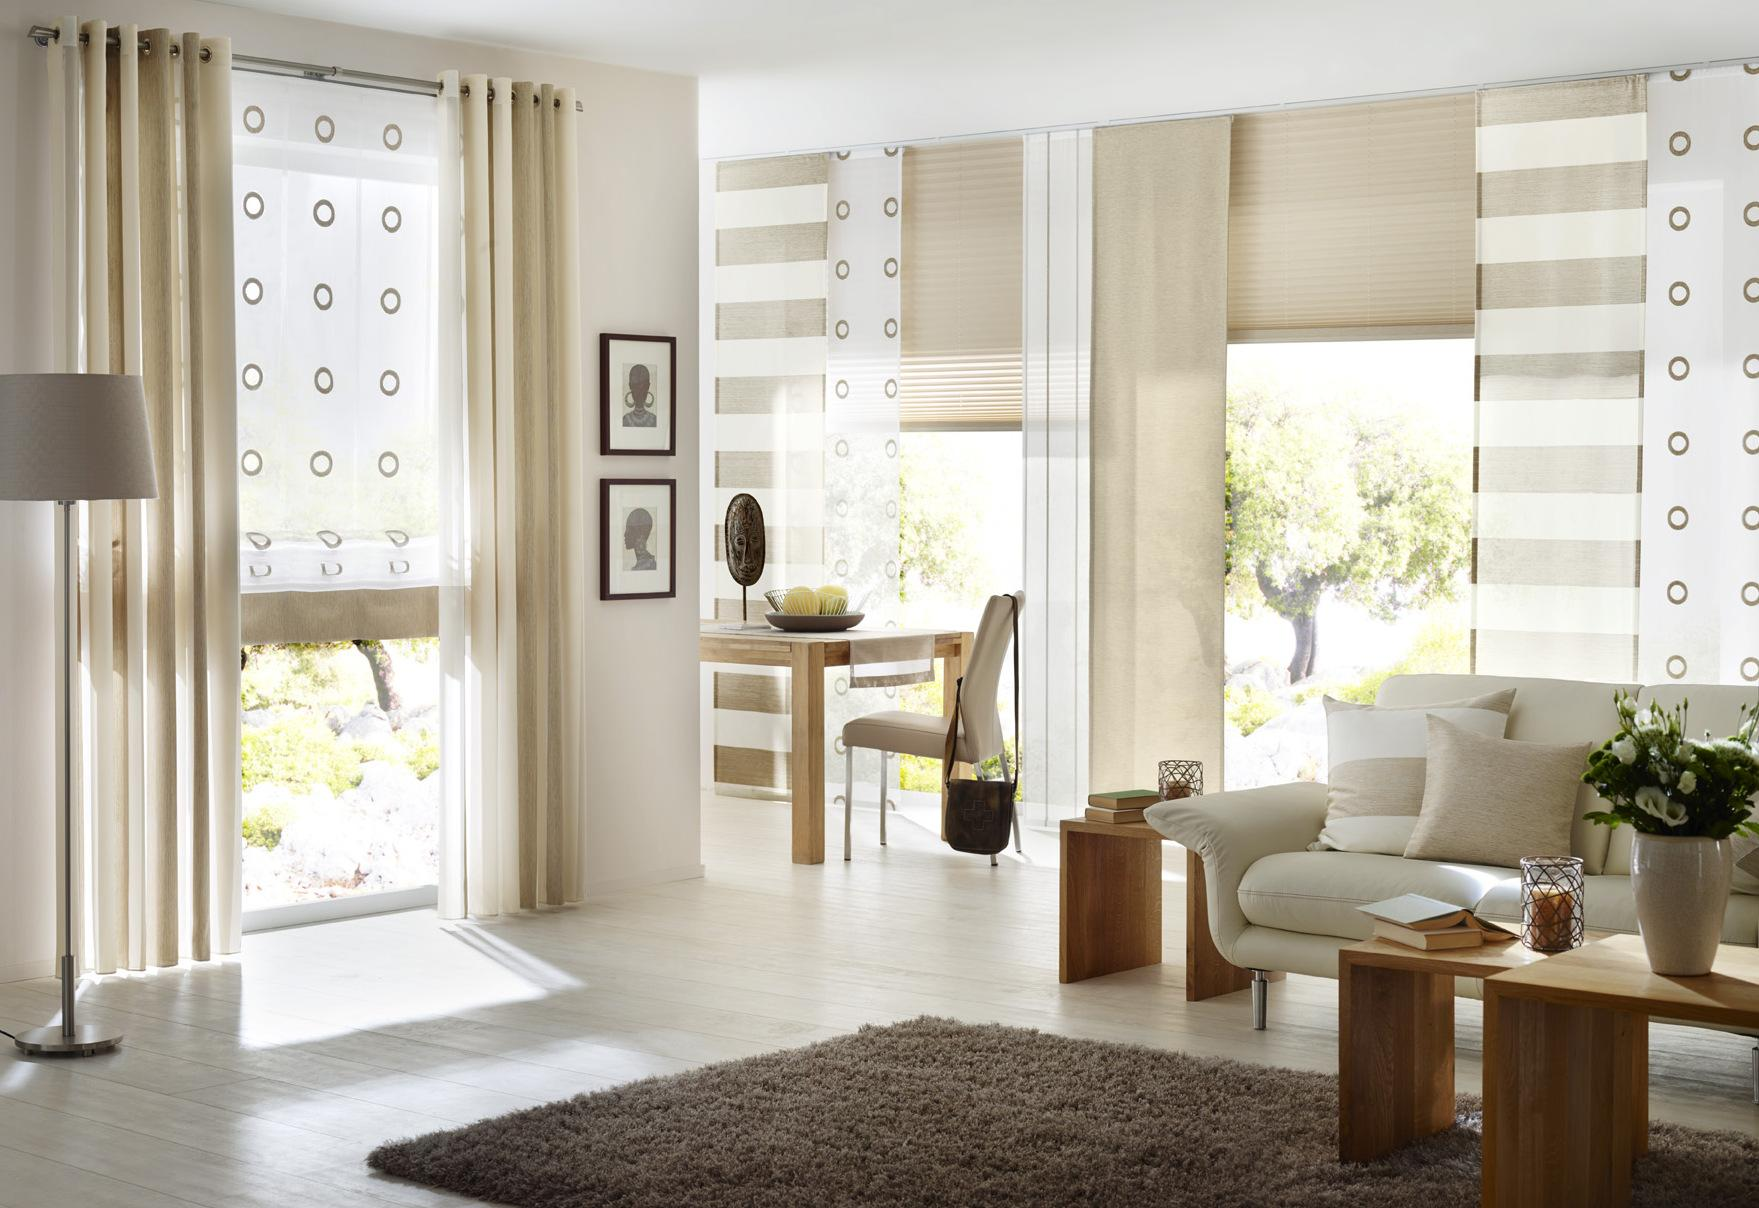 Beigefarbener Vorhang • Bilder & Ideen • COUCHstyle